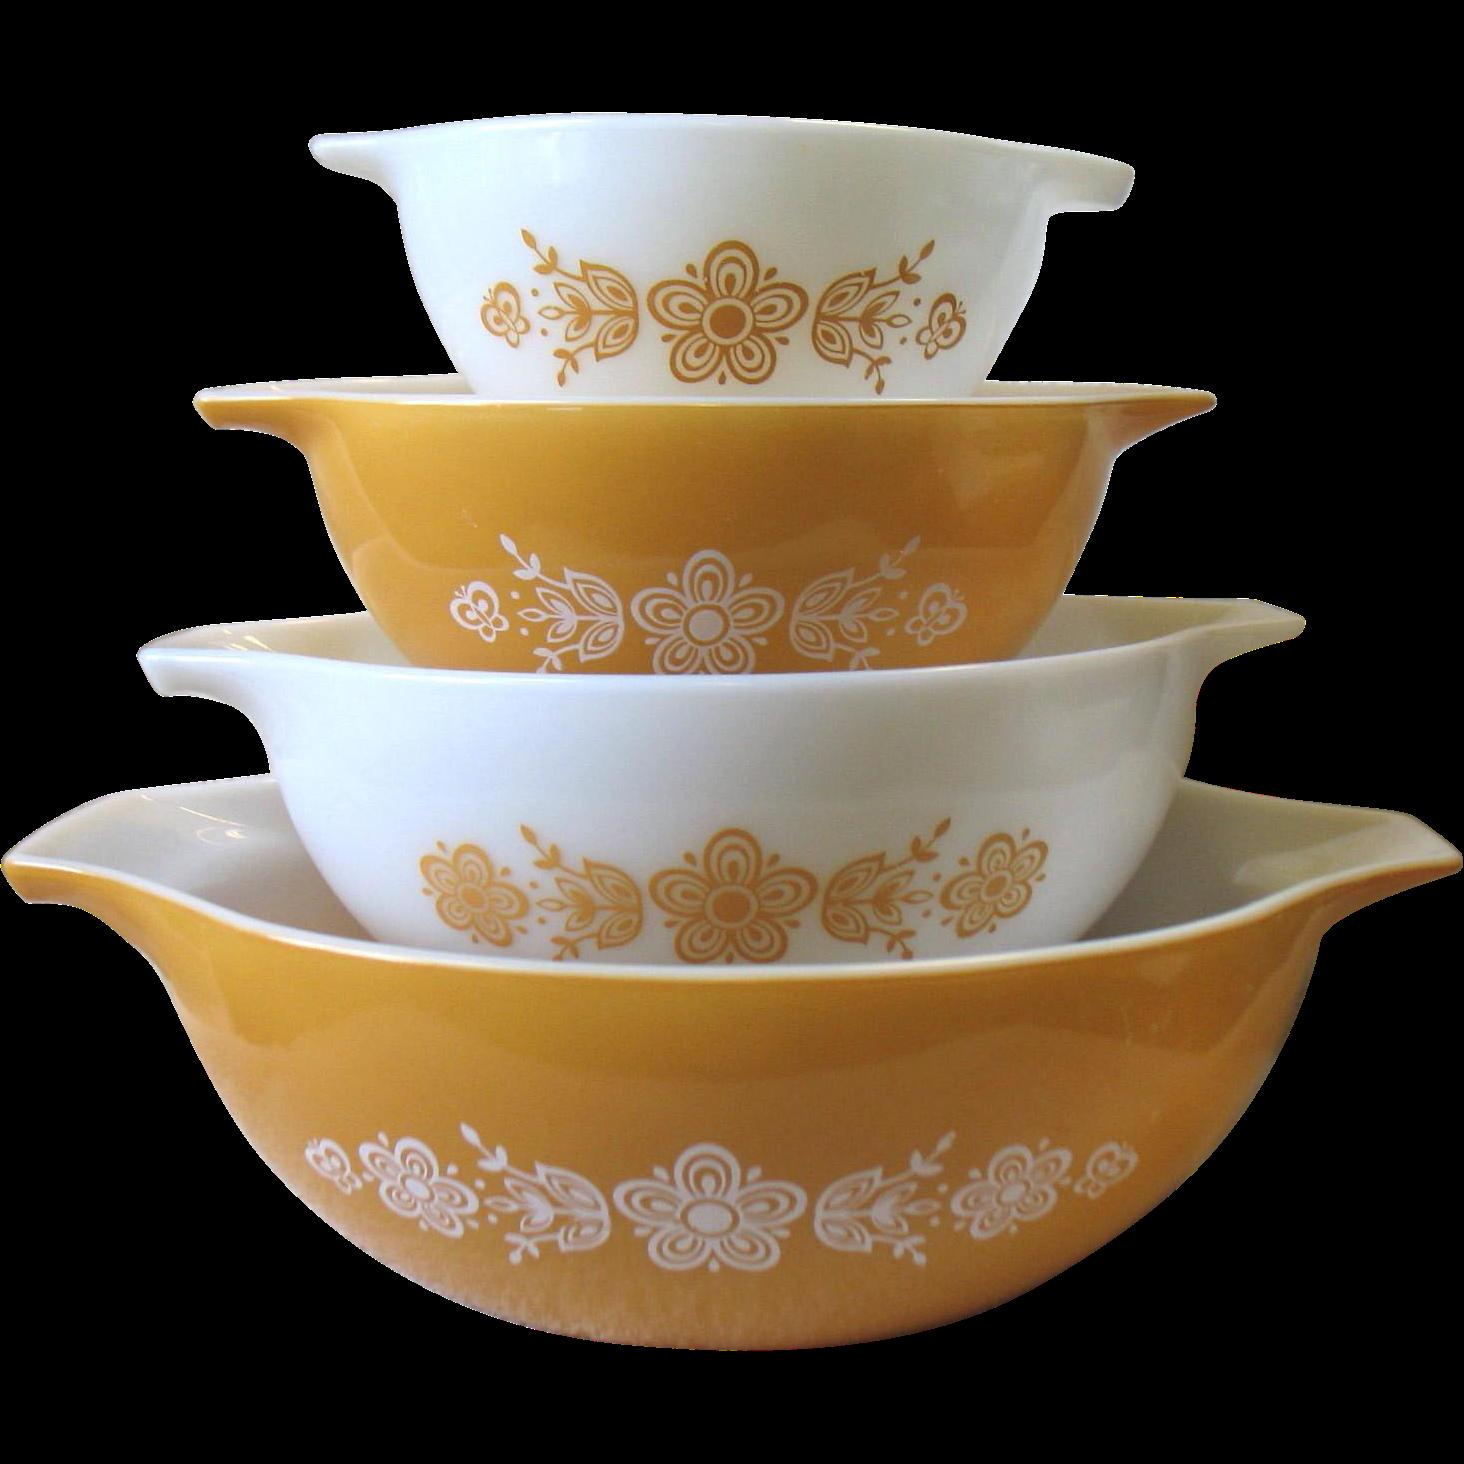 Vintage Pyrex Gold Butterfly Cinderella Bowl Set of 4